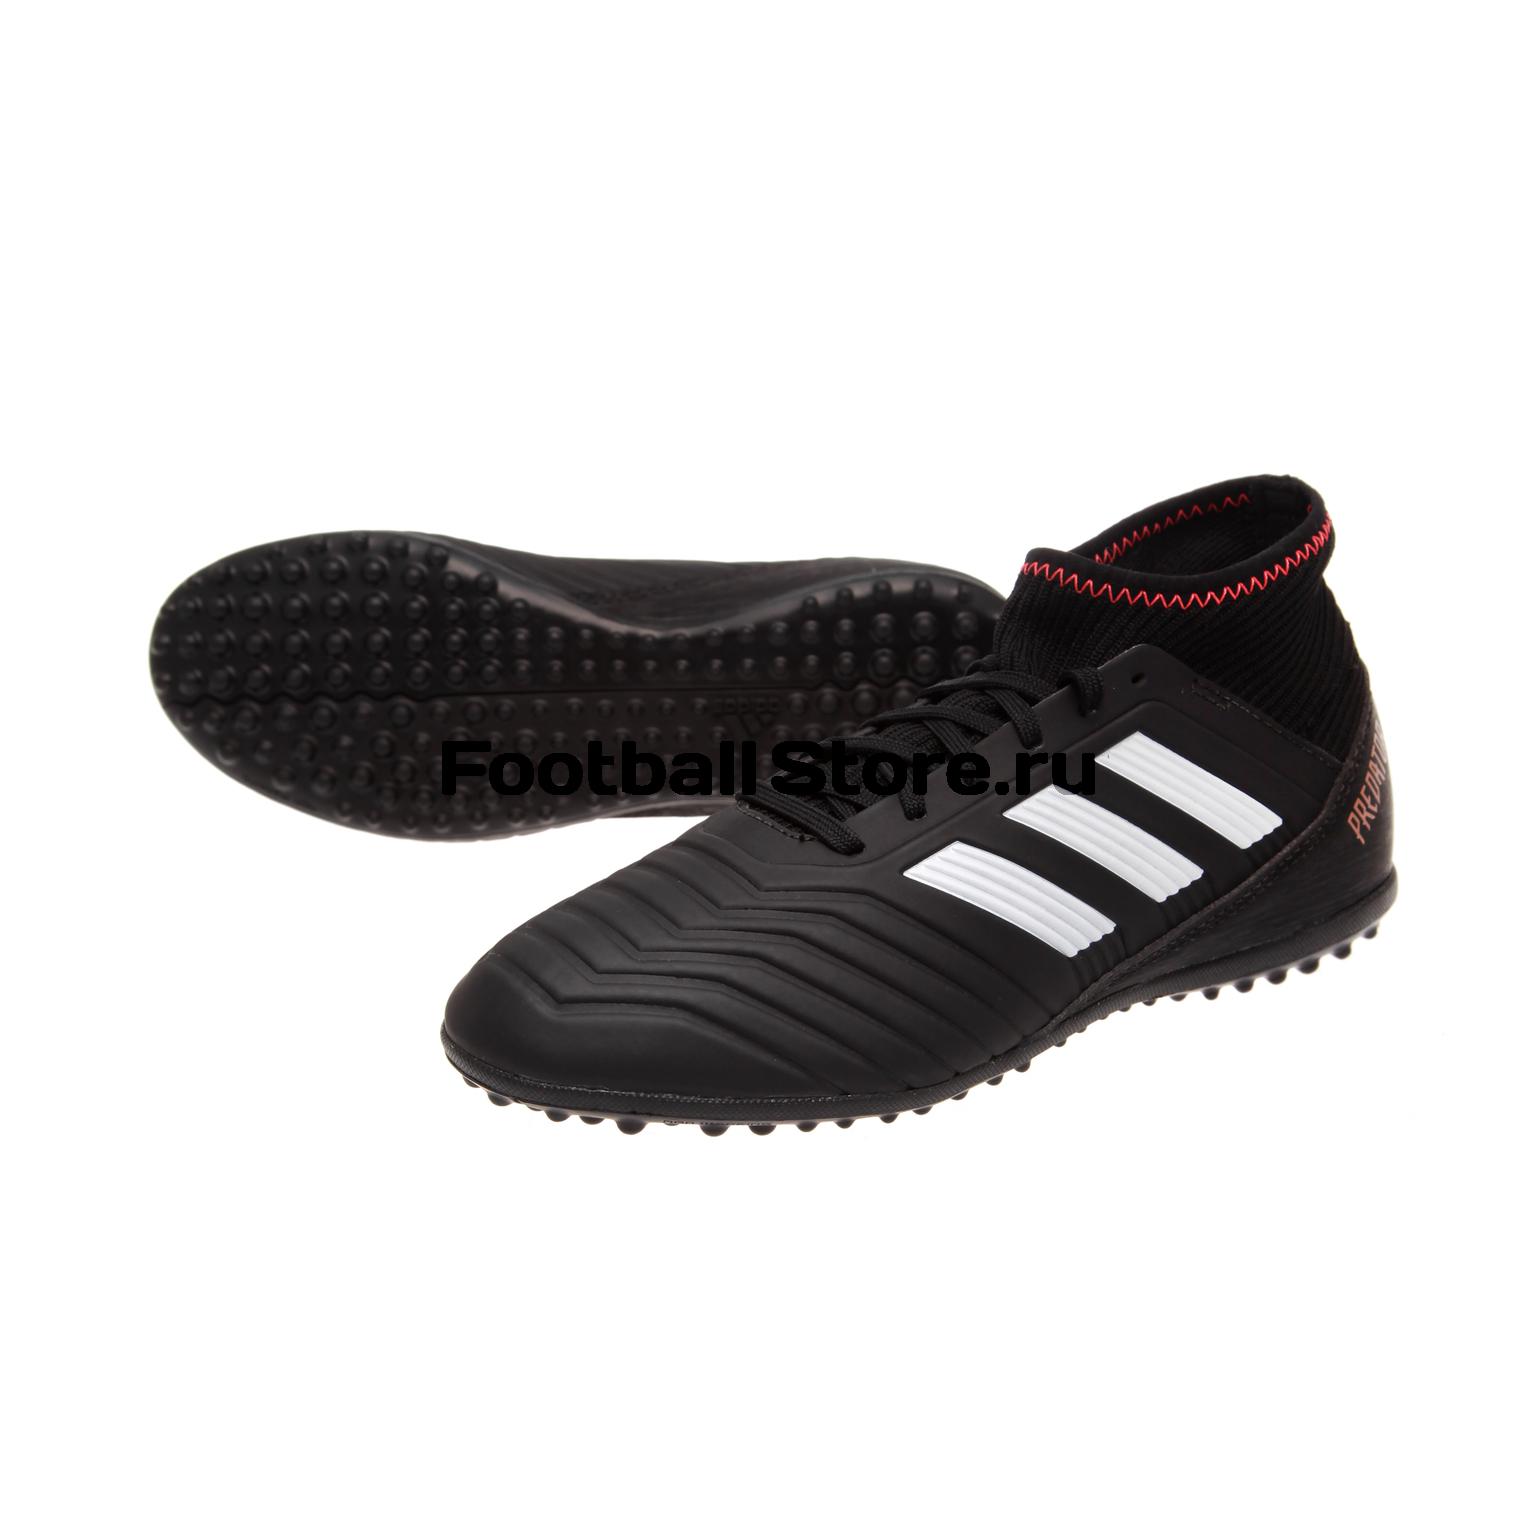 Шиповки Adidas Predator Tango 18.3 TF JR CP9039 adidas predator junior gk glove